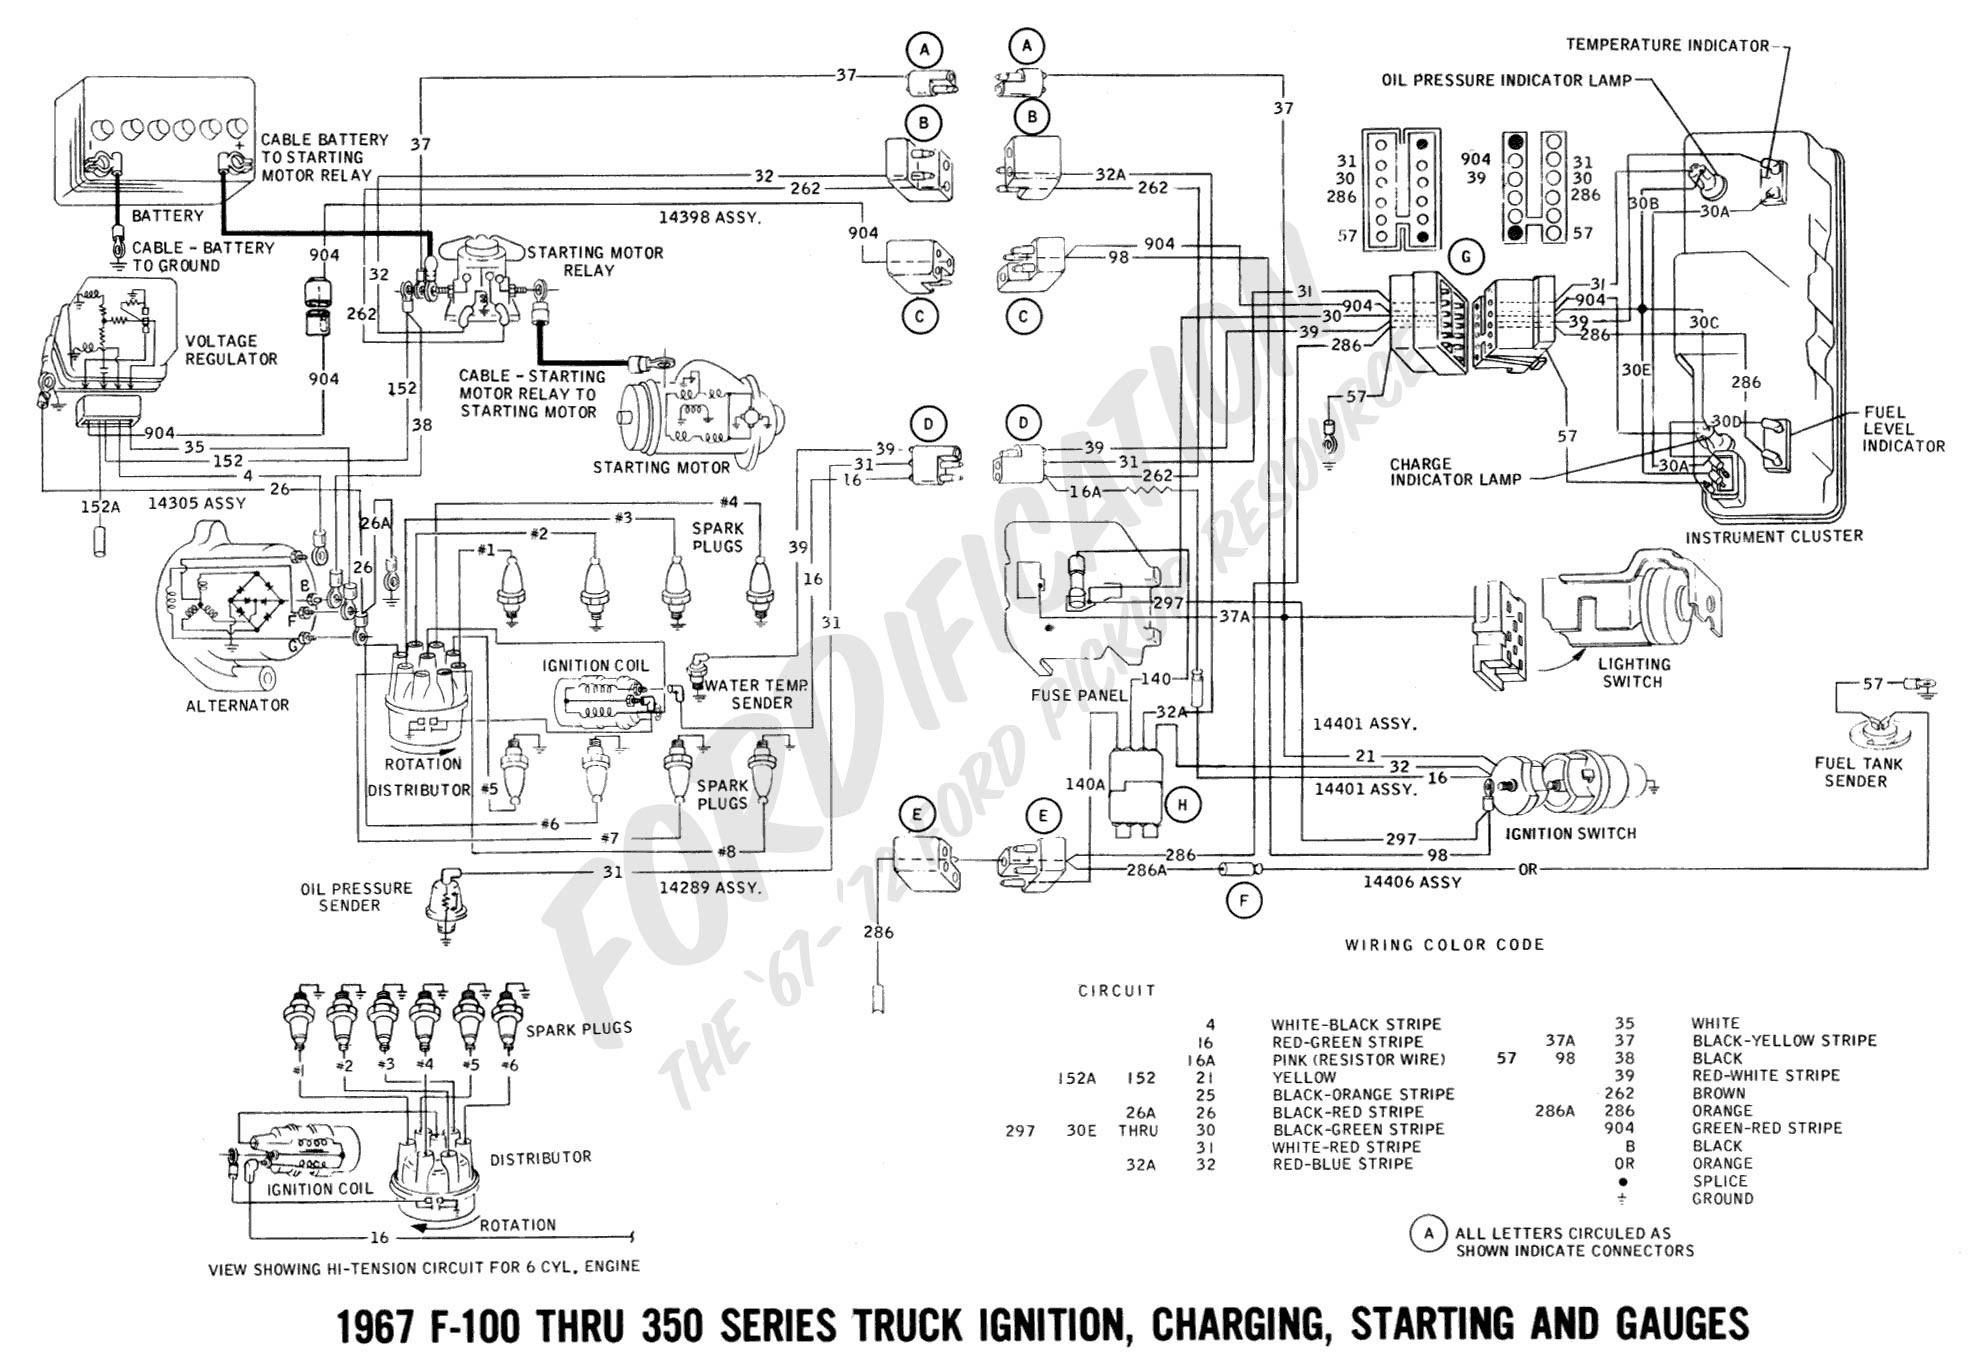 Fuse Box Javelin - Wiring Diagram | Volvo B10m Fuse Box |  | Wiring Diagram